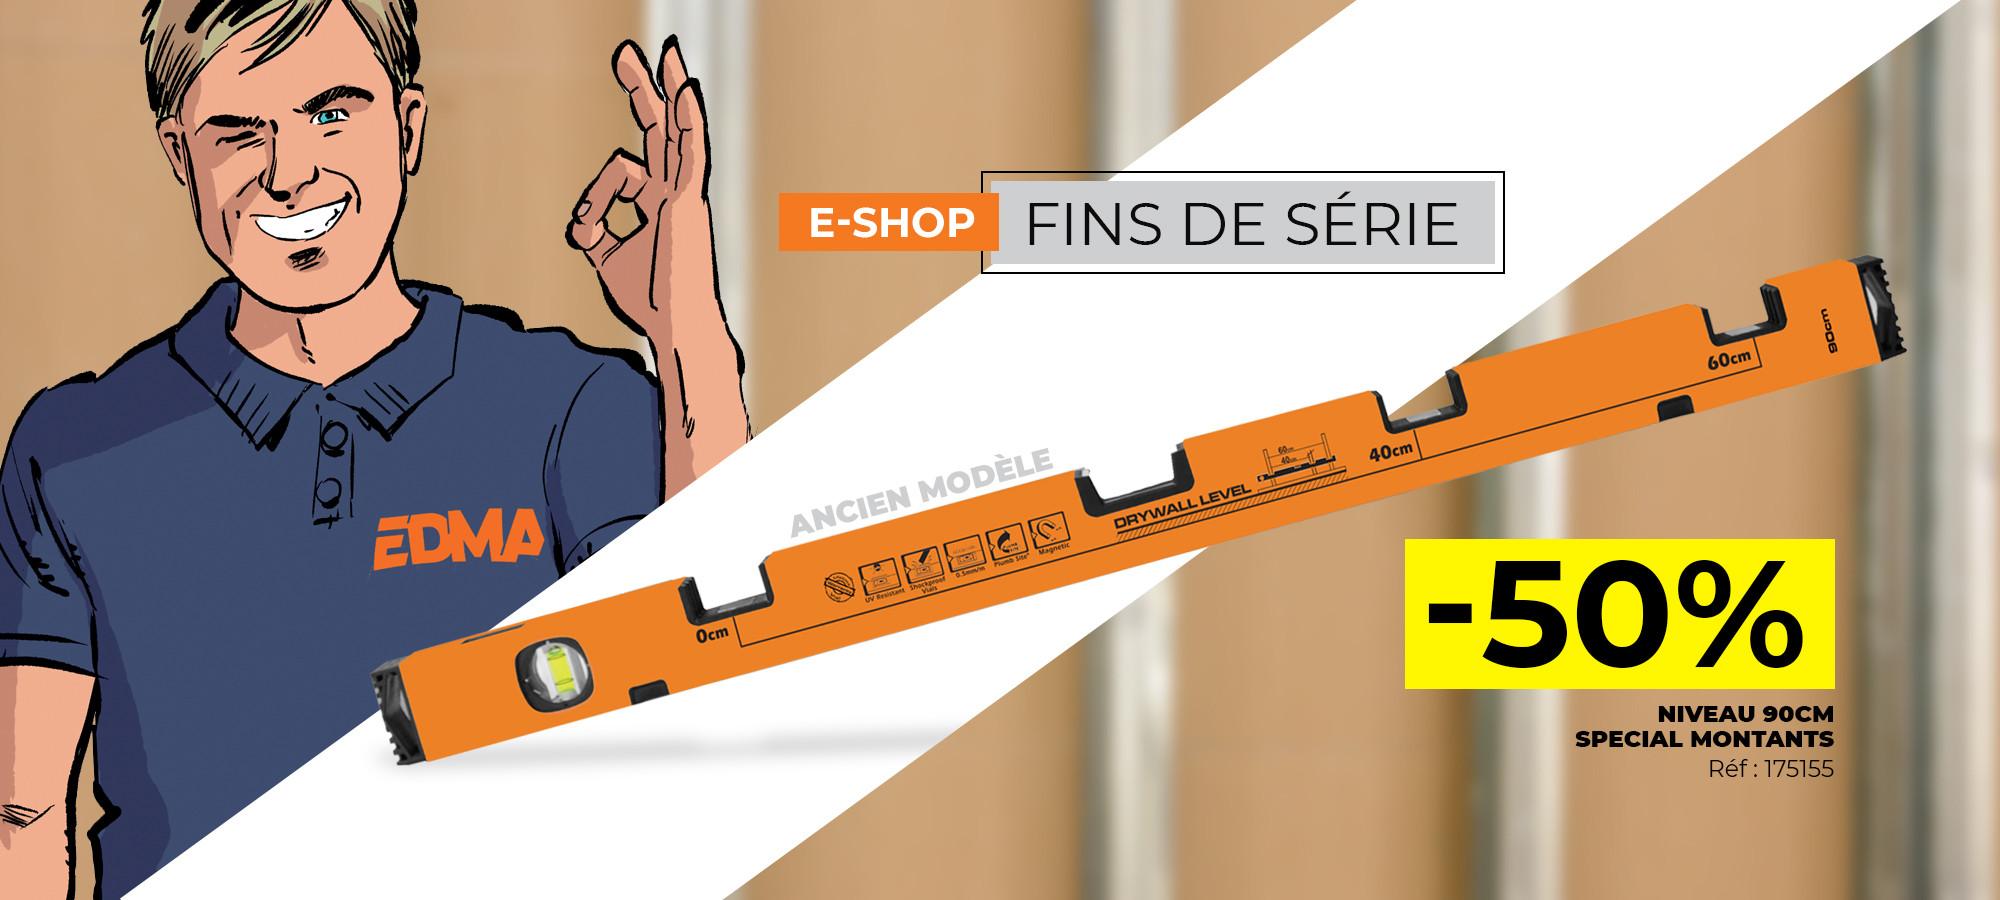 E-SHOP FINS DE SÉRIES